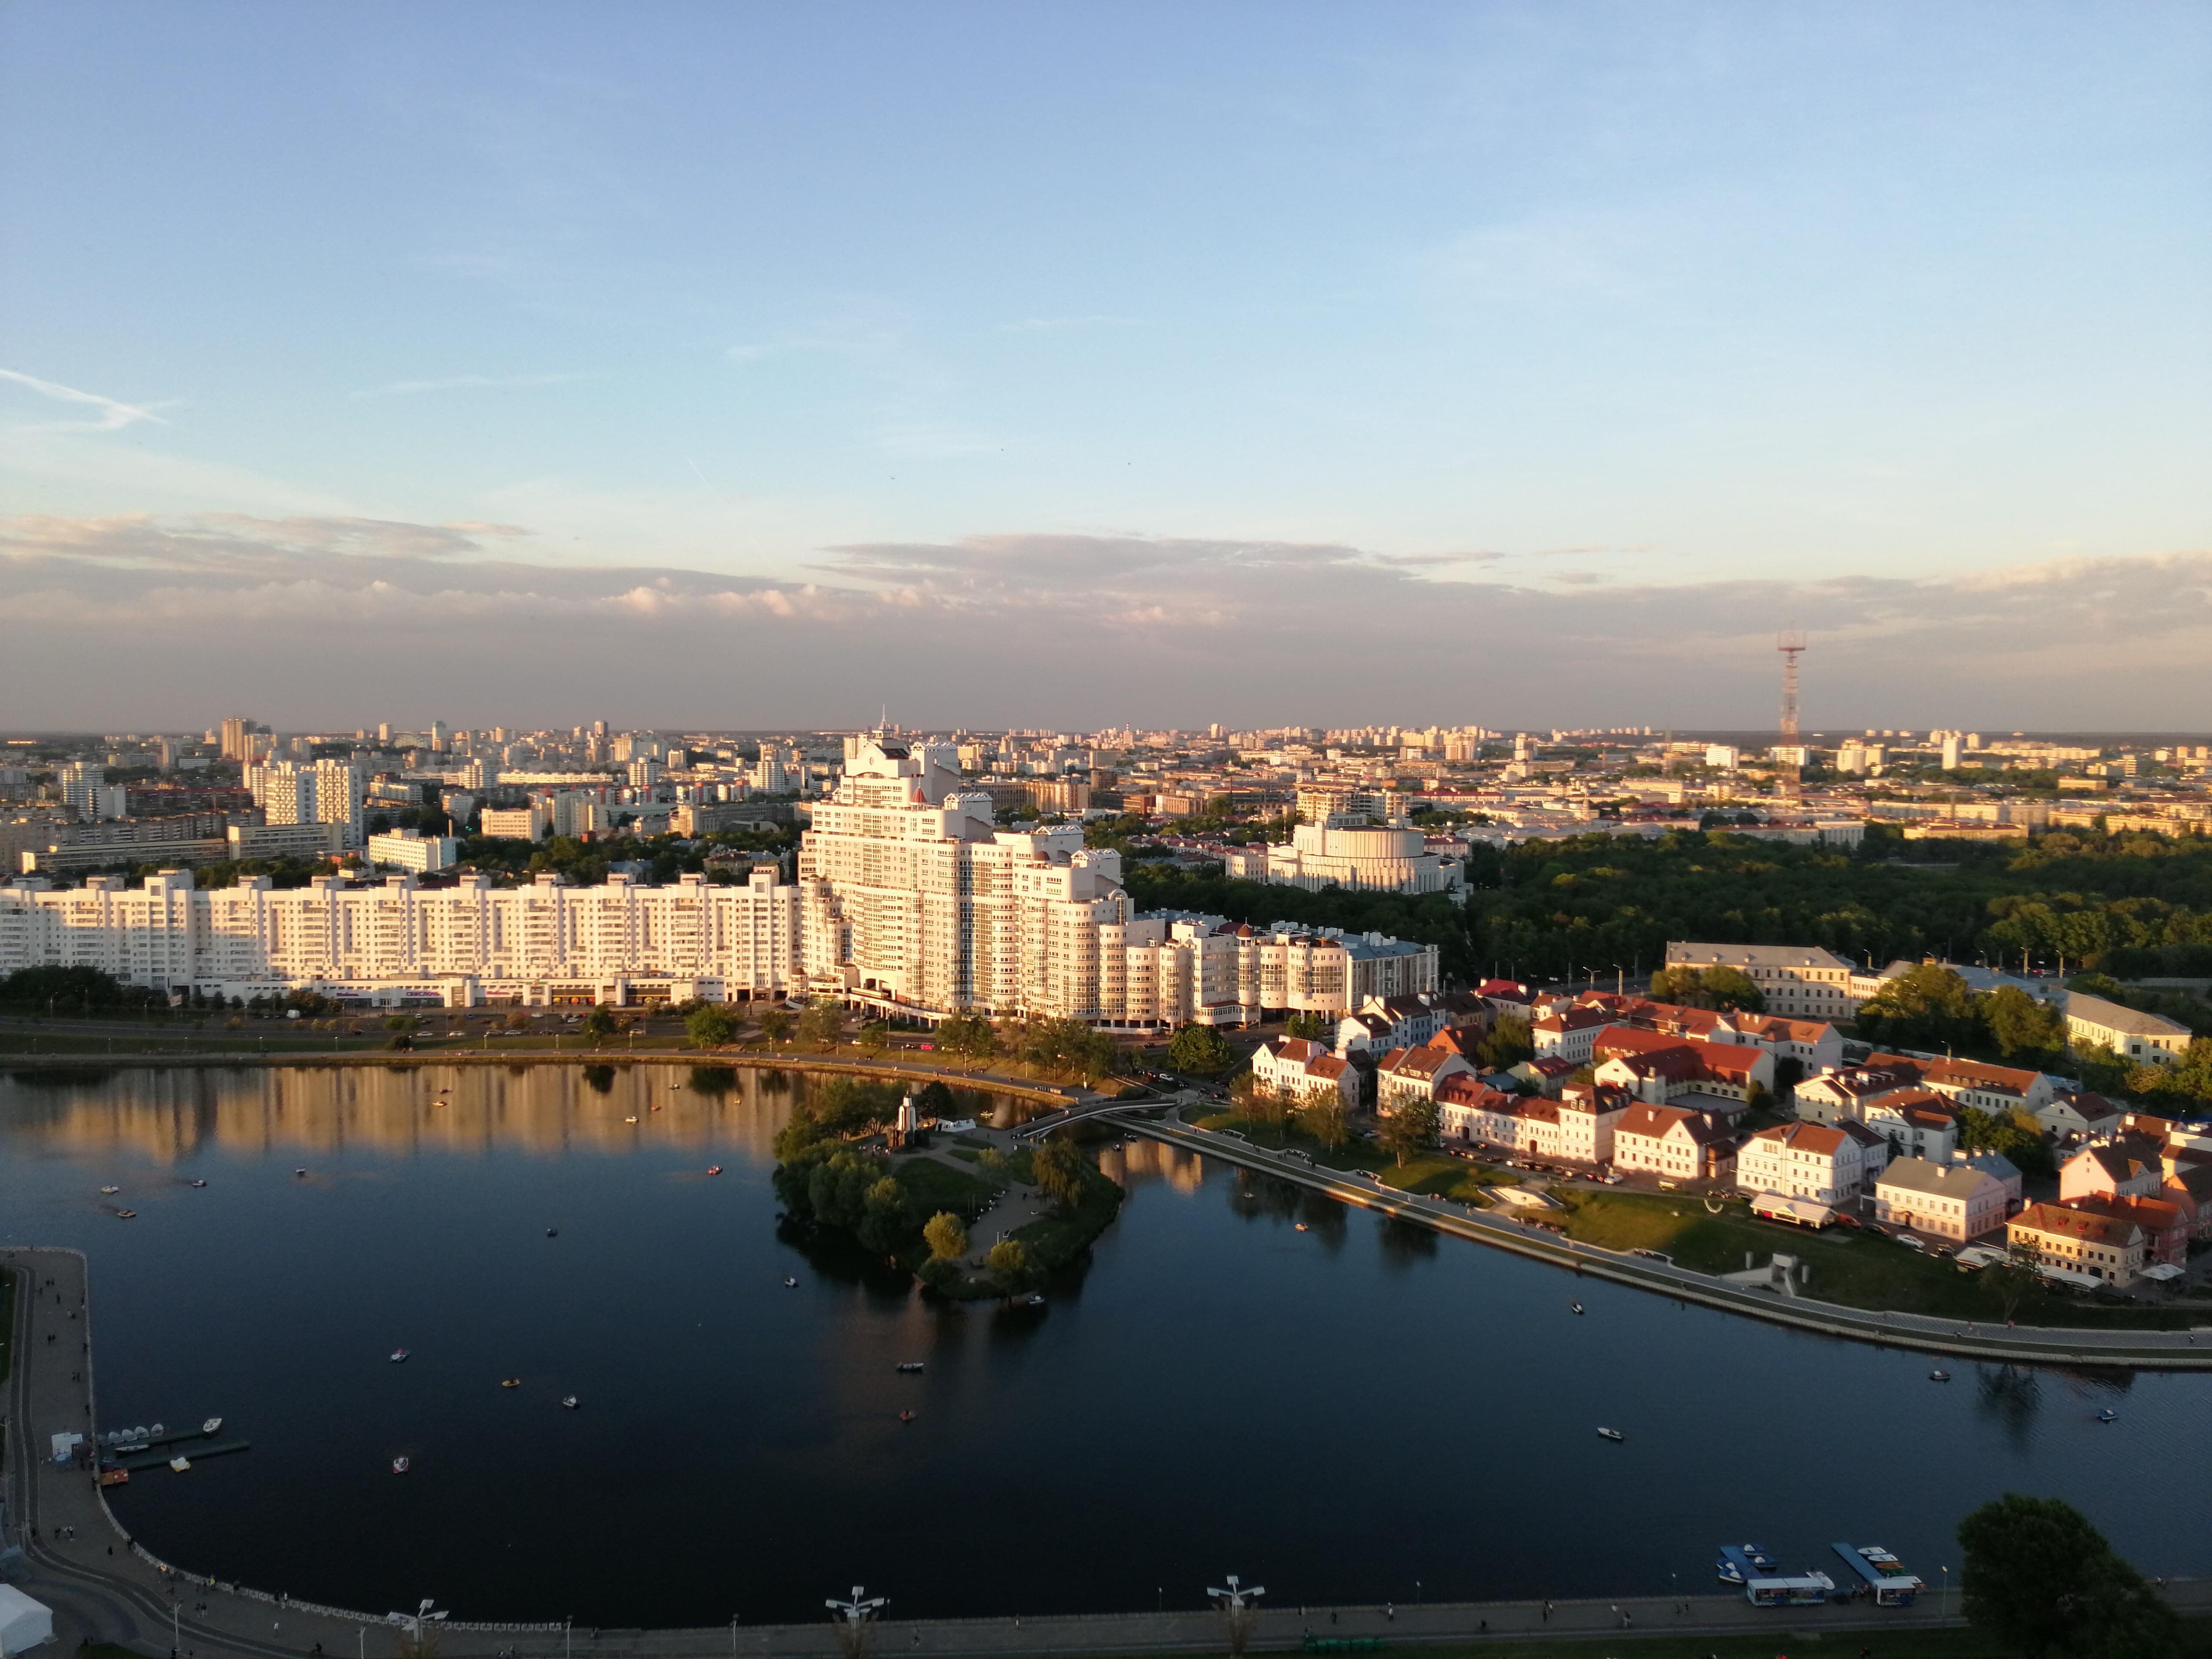 belorusija, dipos, dipservis belorusija, dipservice, dipos, nekretnine dipos, beograd nekretnine